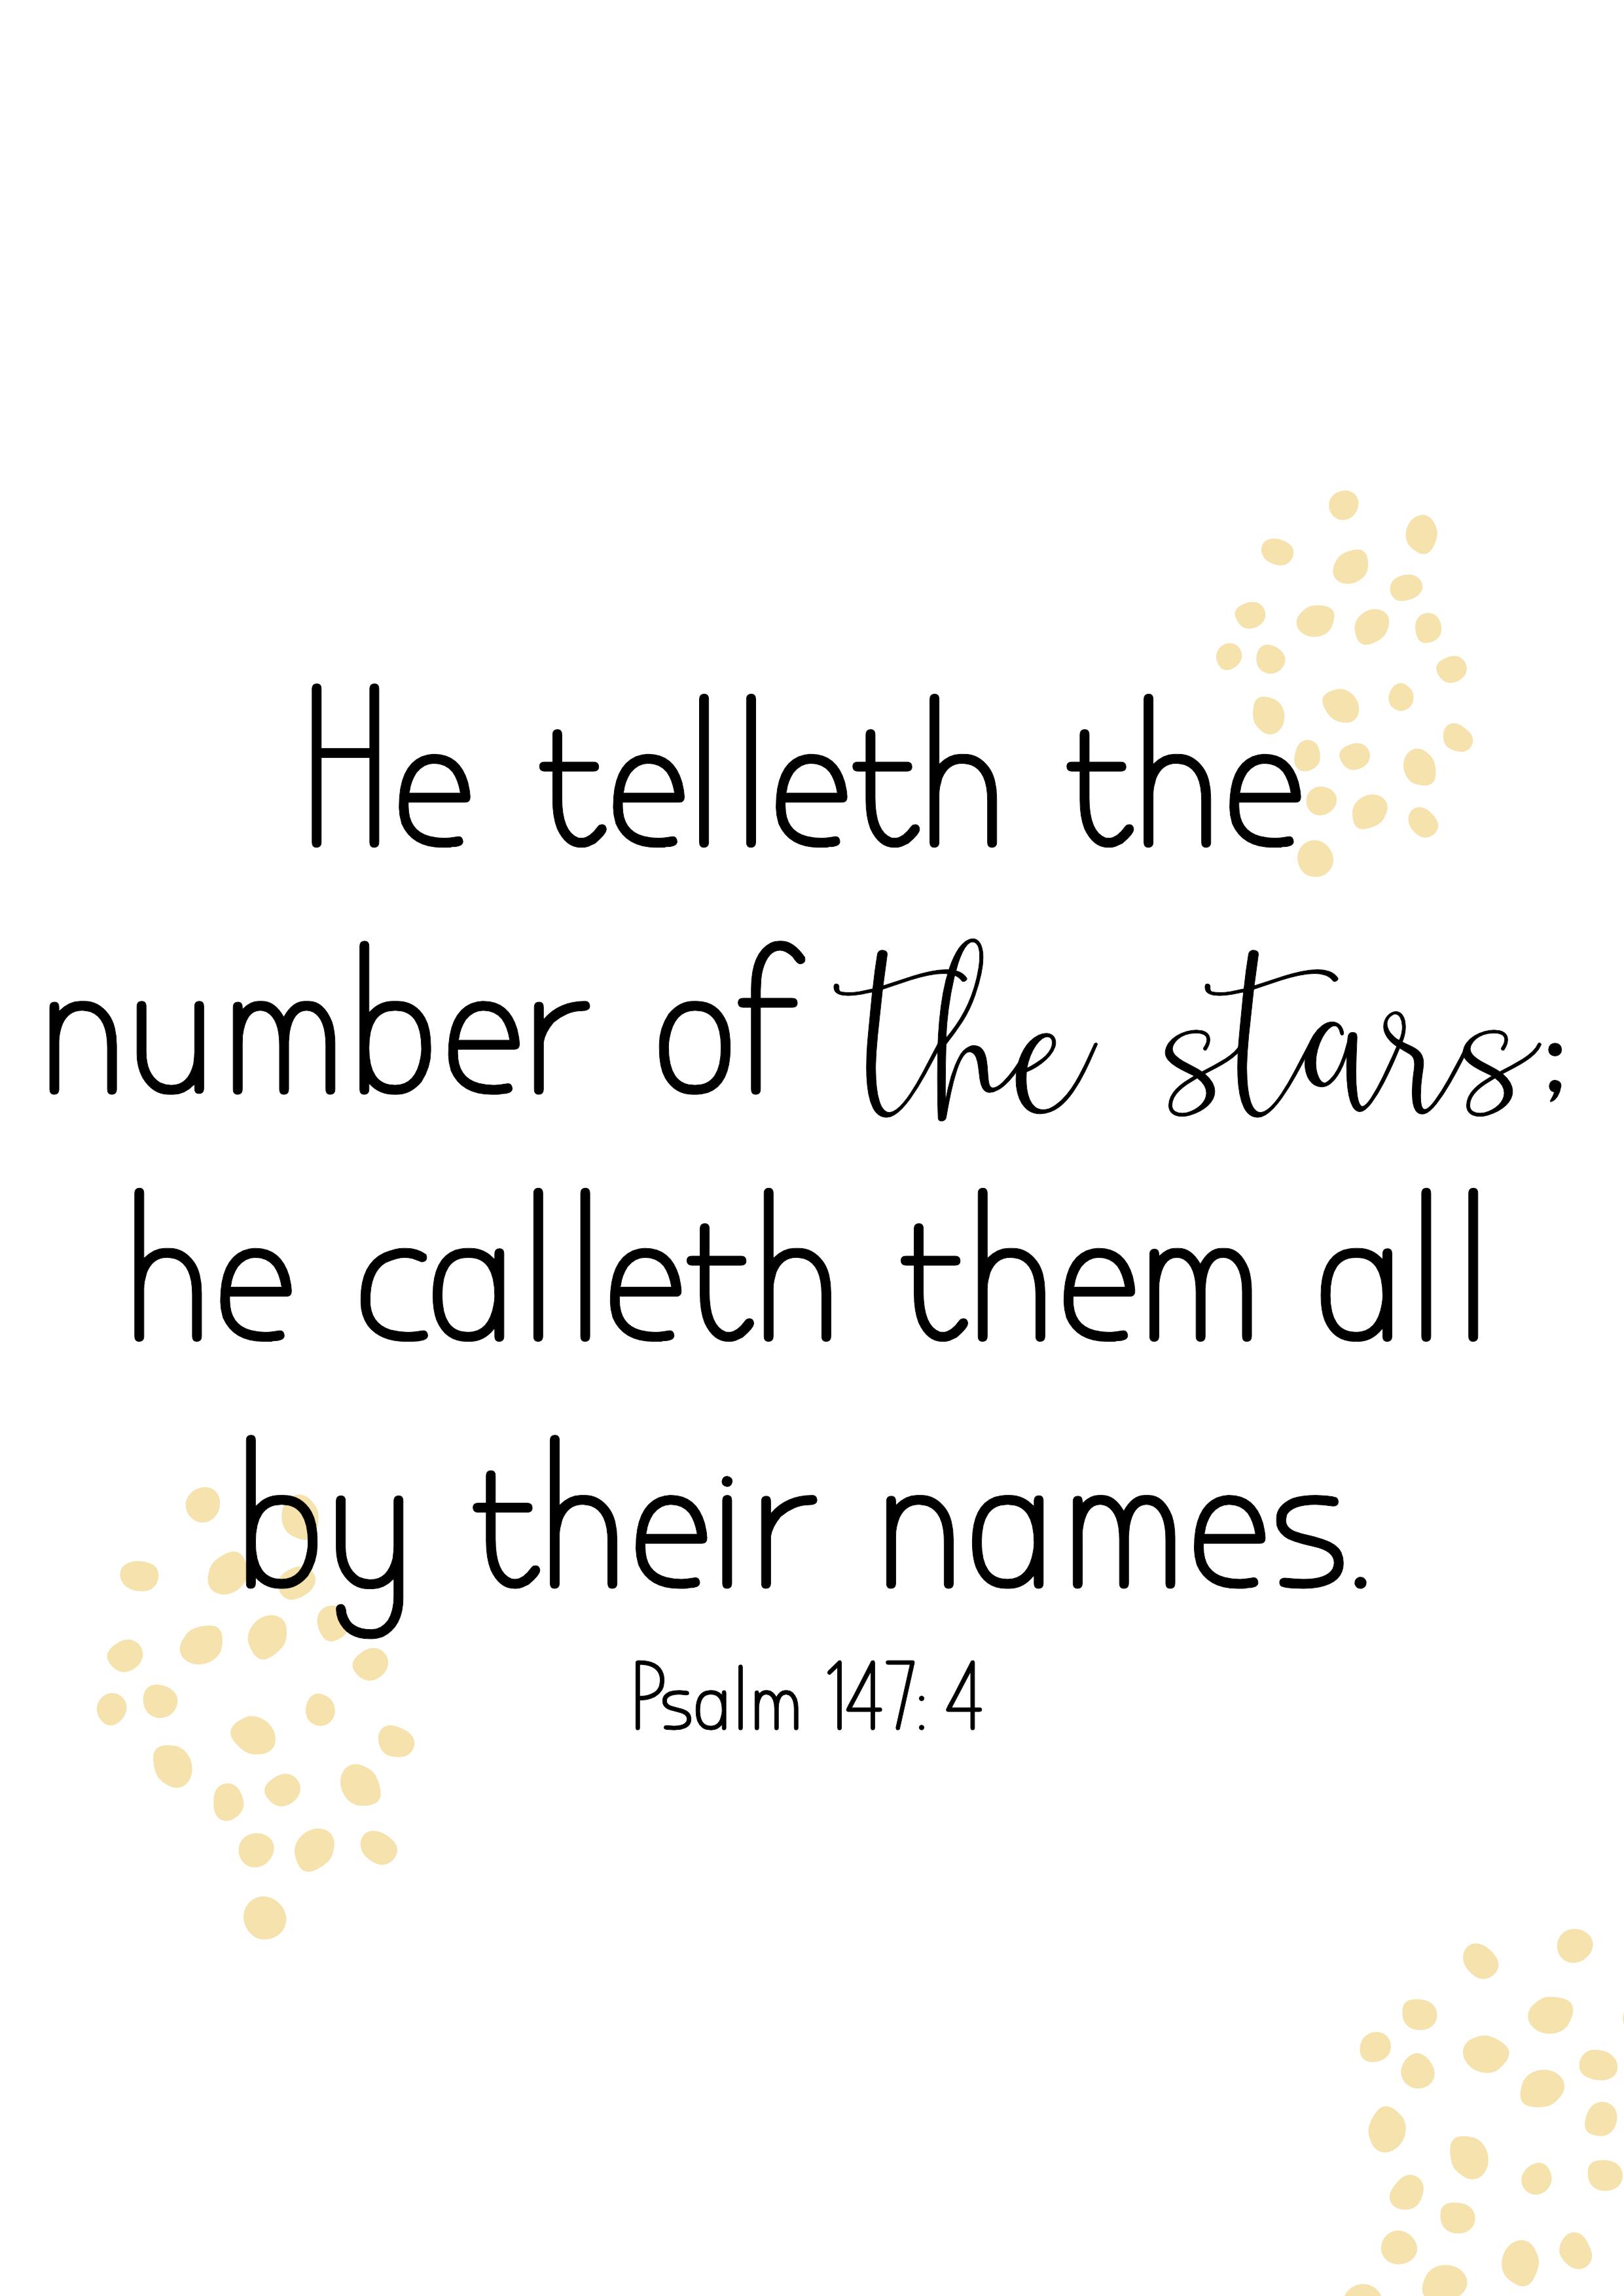 Psalm 147:4, Poster, Jpg, King James Bible 1611, ministries, Nederland